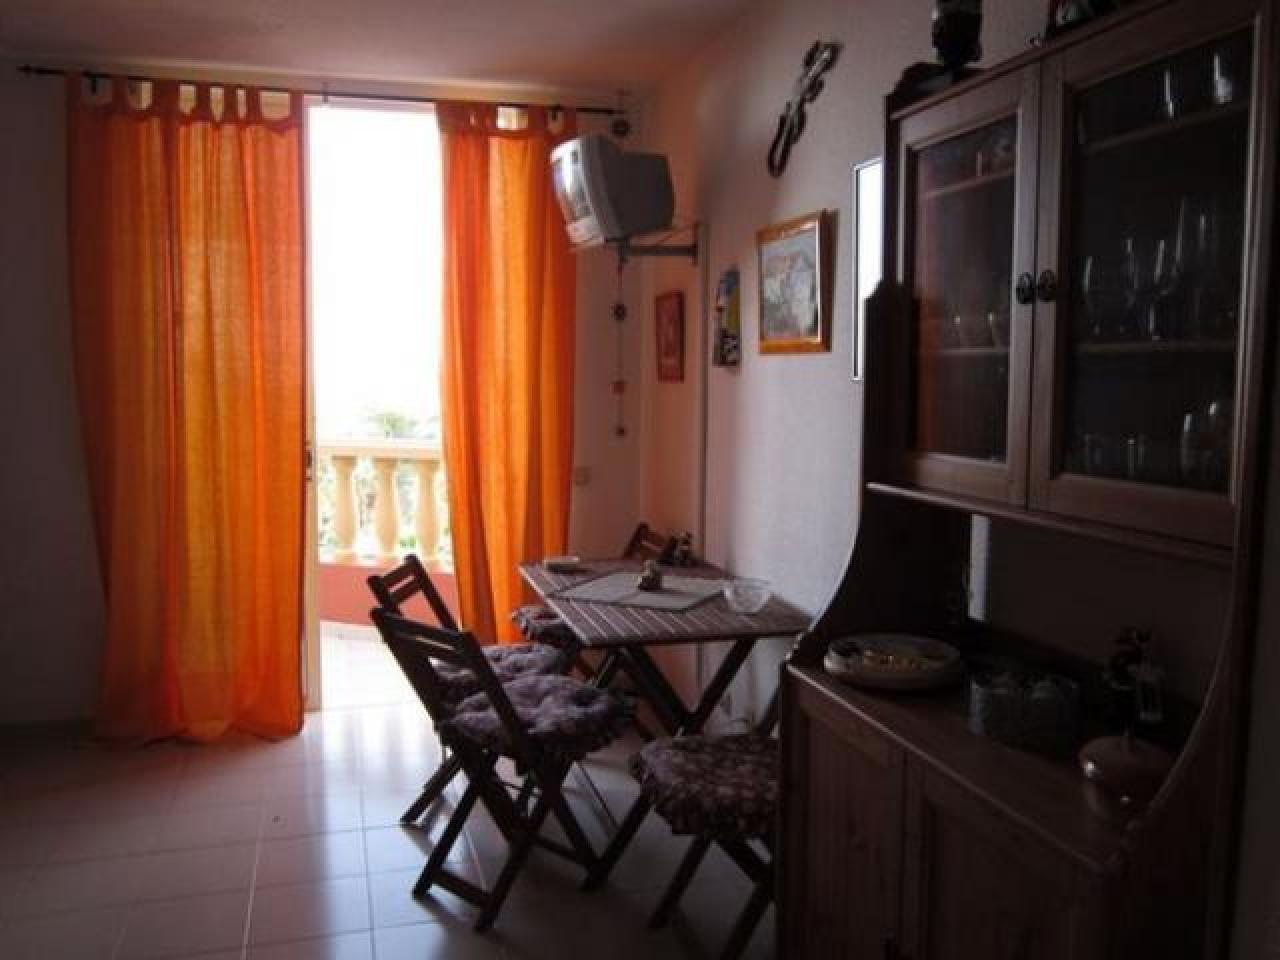 Apartment in Tenerife to rent - 5